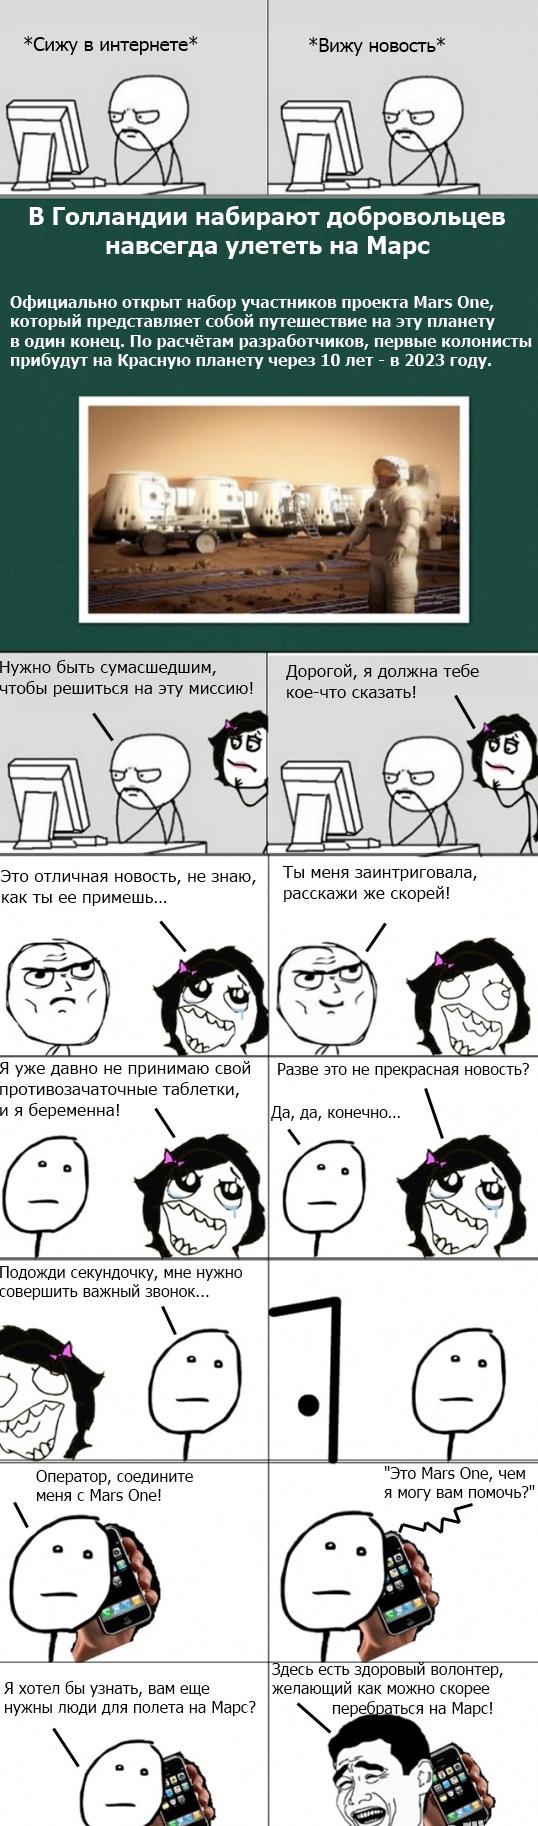 Смешные комиксы BroDude.ru smeshnie komiksi 1138071789